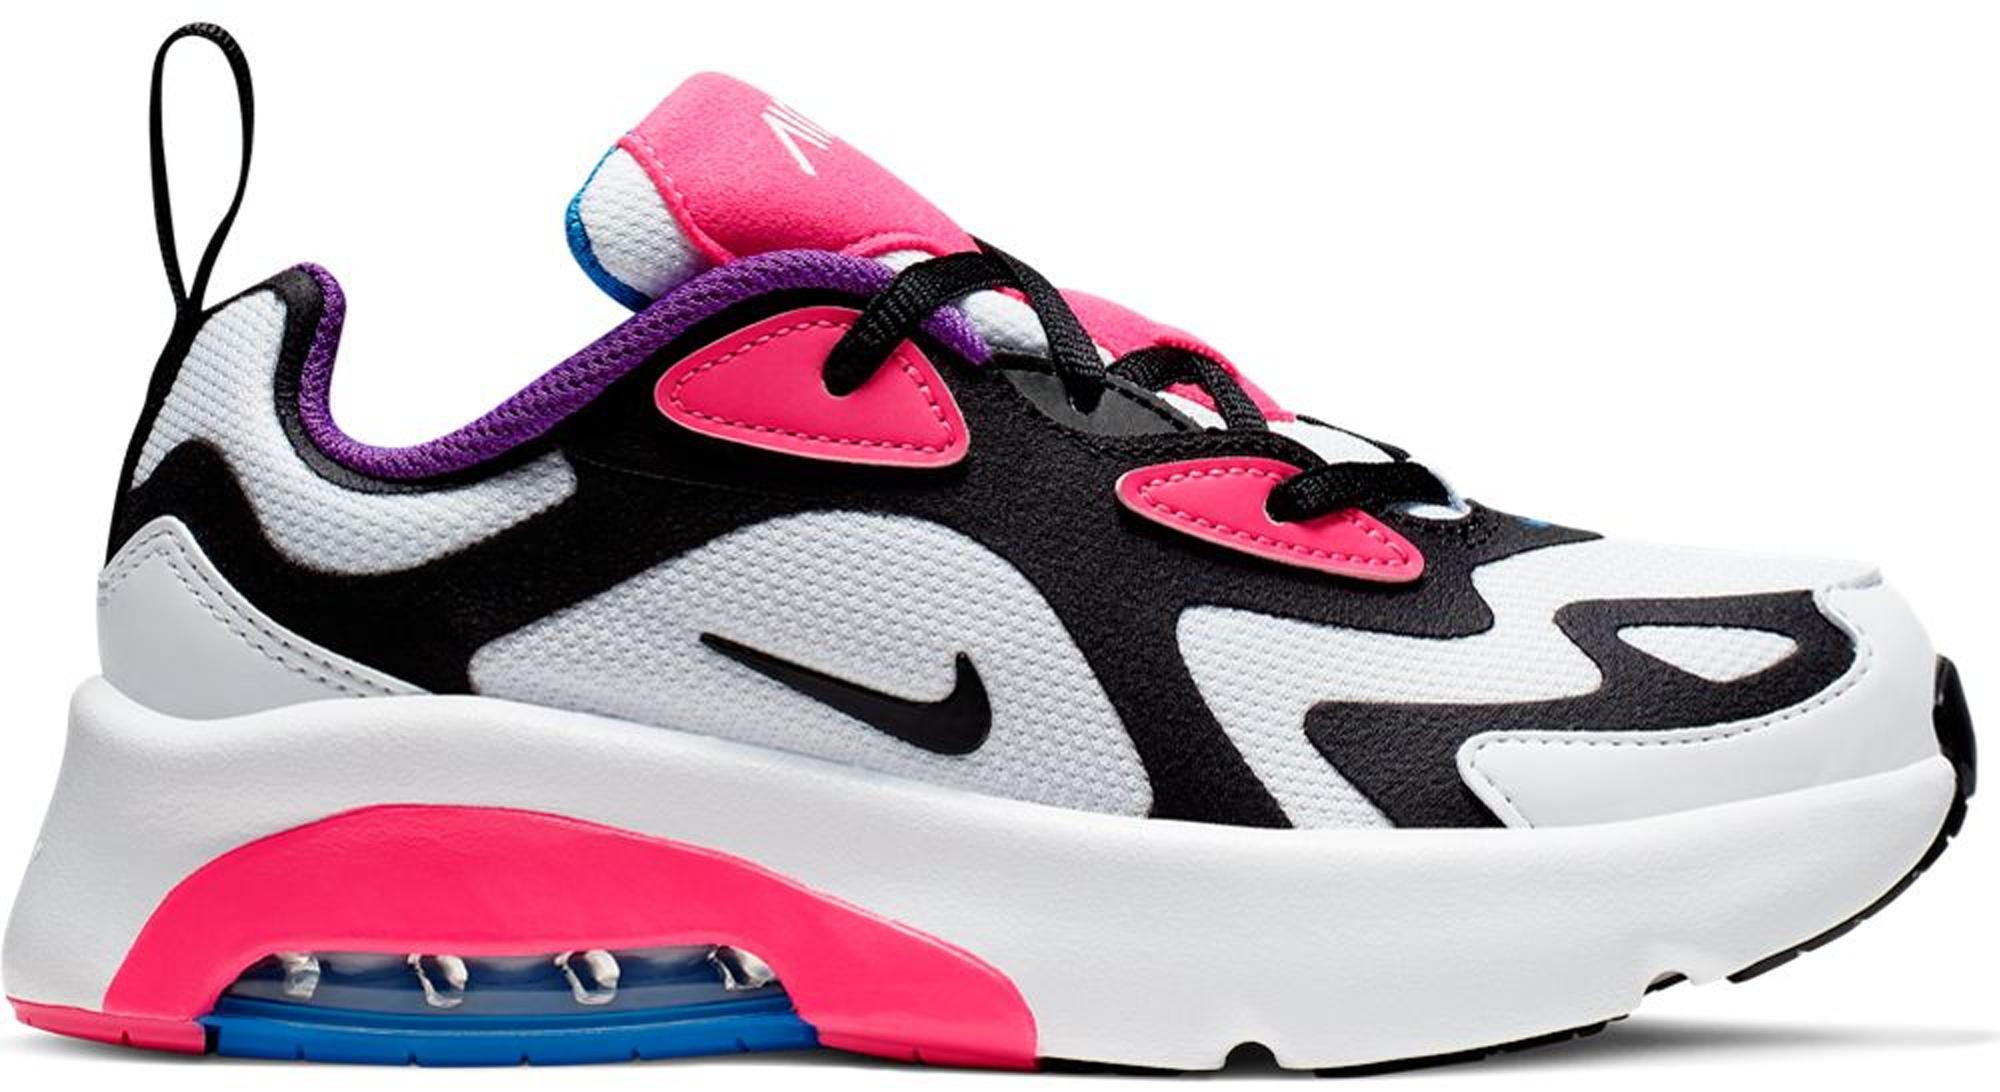 Nike Air Max 200 White Hyper Pink Black